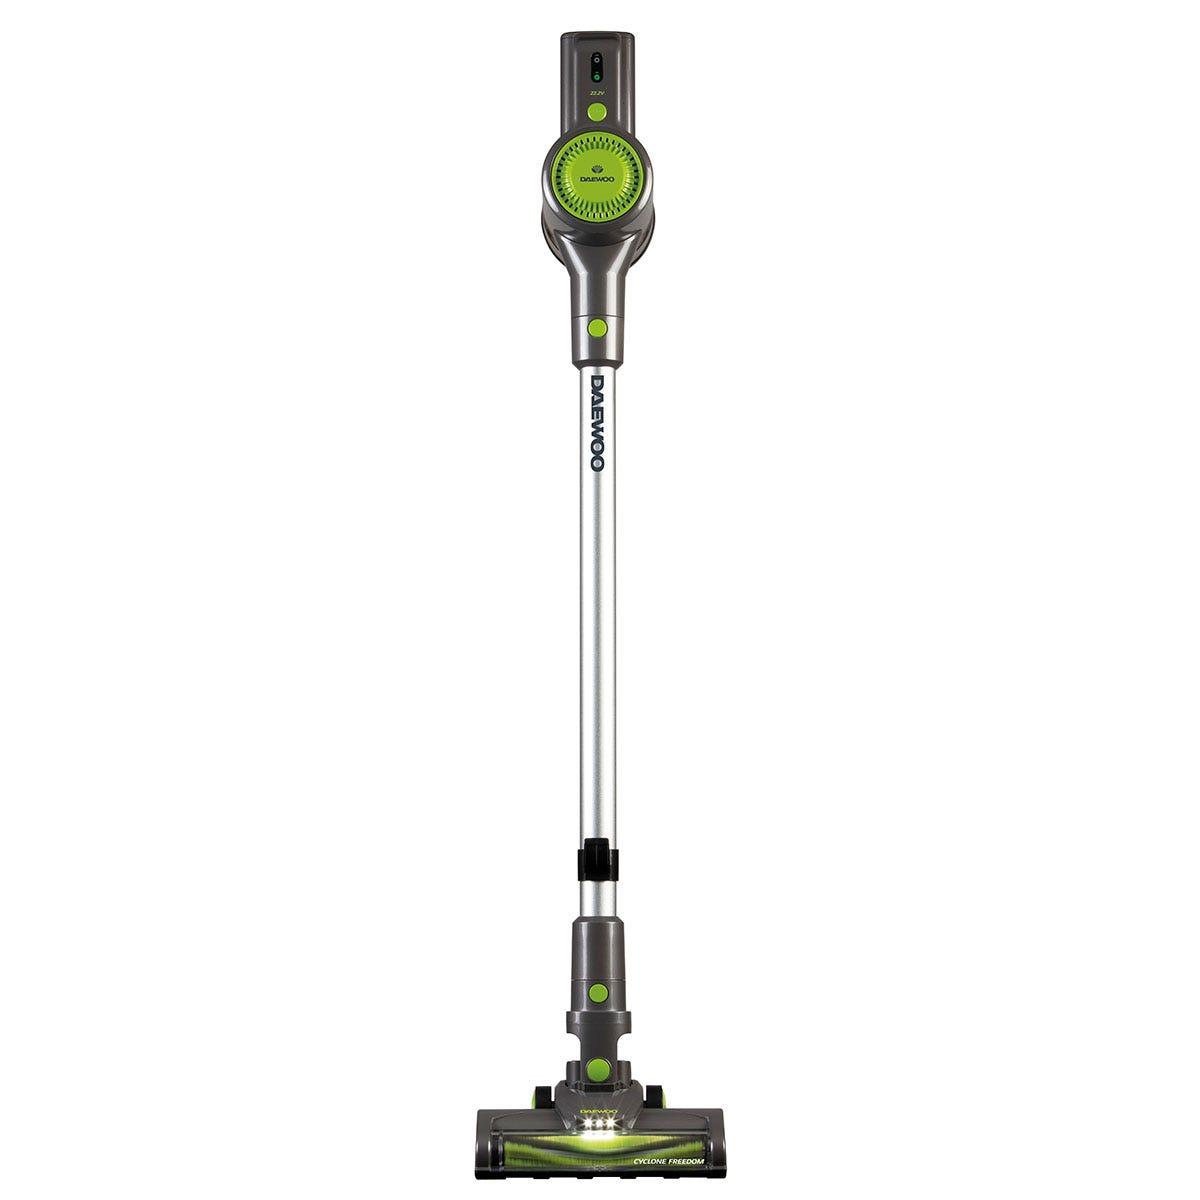 Daewoo FLR00010GE Cyclone Pro 120W Cordless Handheld Vacuum Cleaner - Grey, Black, and Green